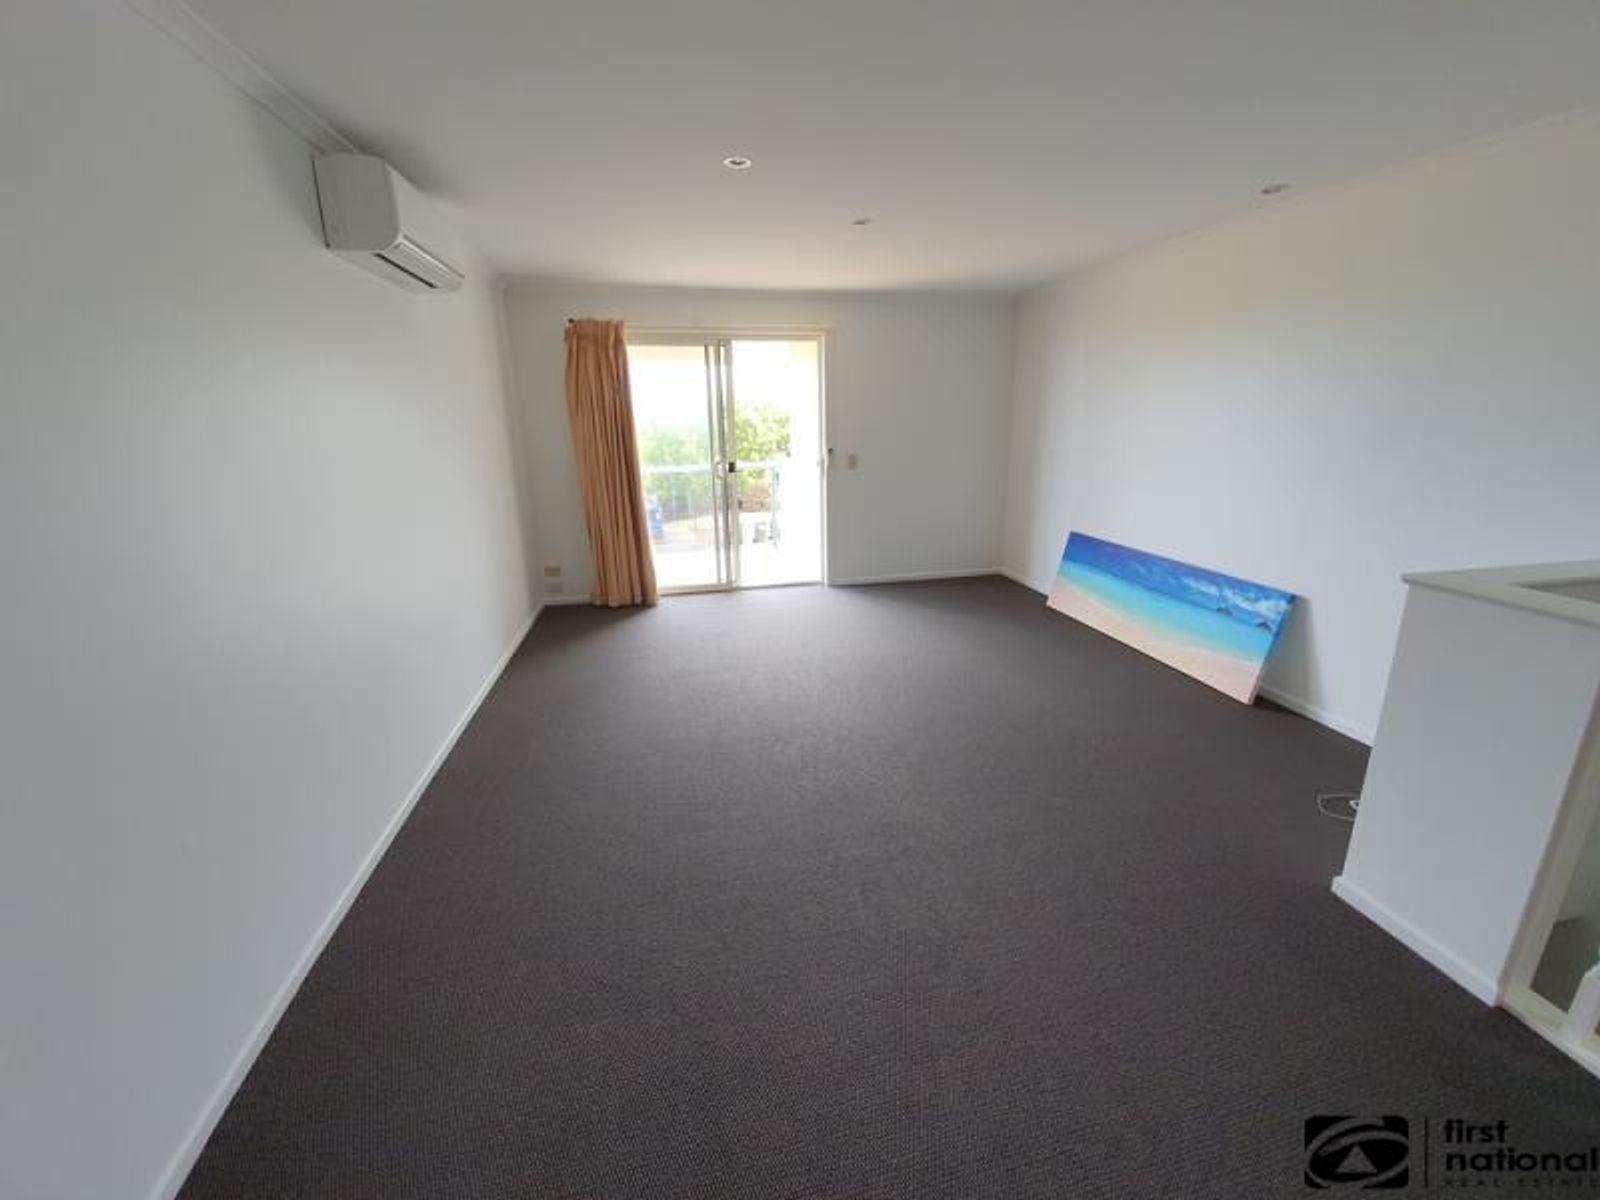 52/94 Solitary Islands Way, Sapphire Beach, NSW 2450